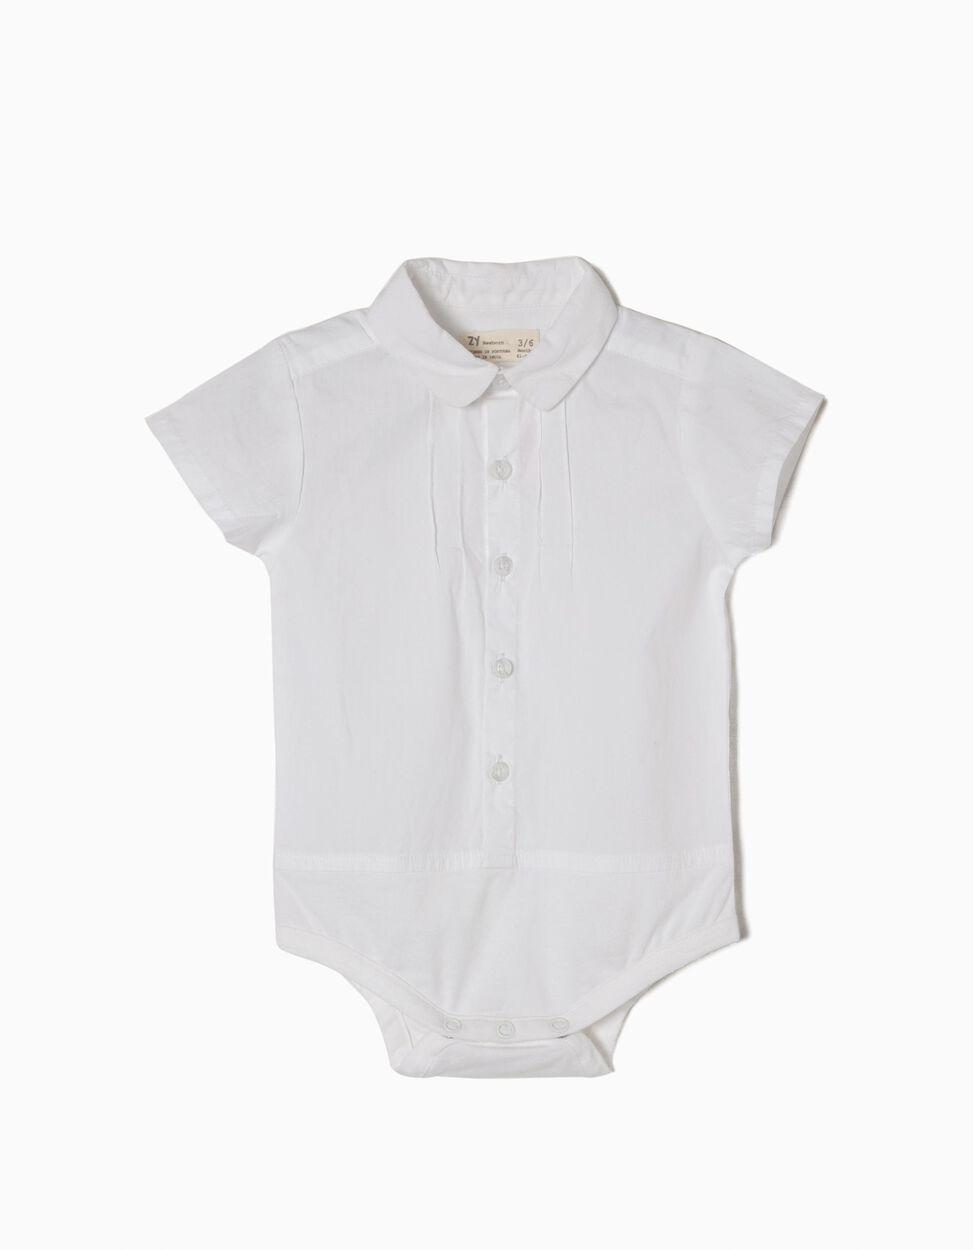 Body Efeito Camisa